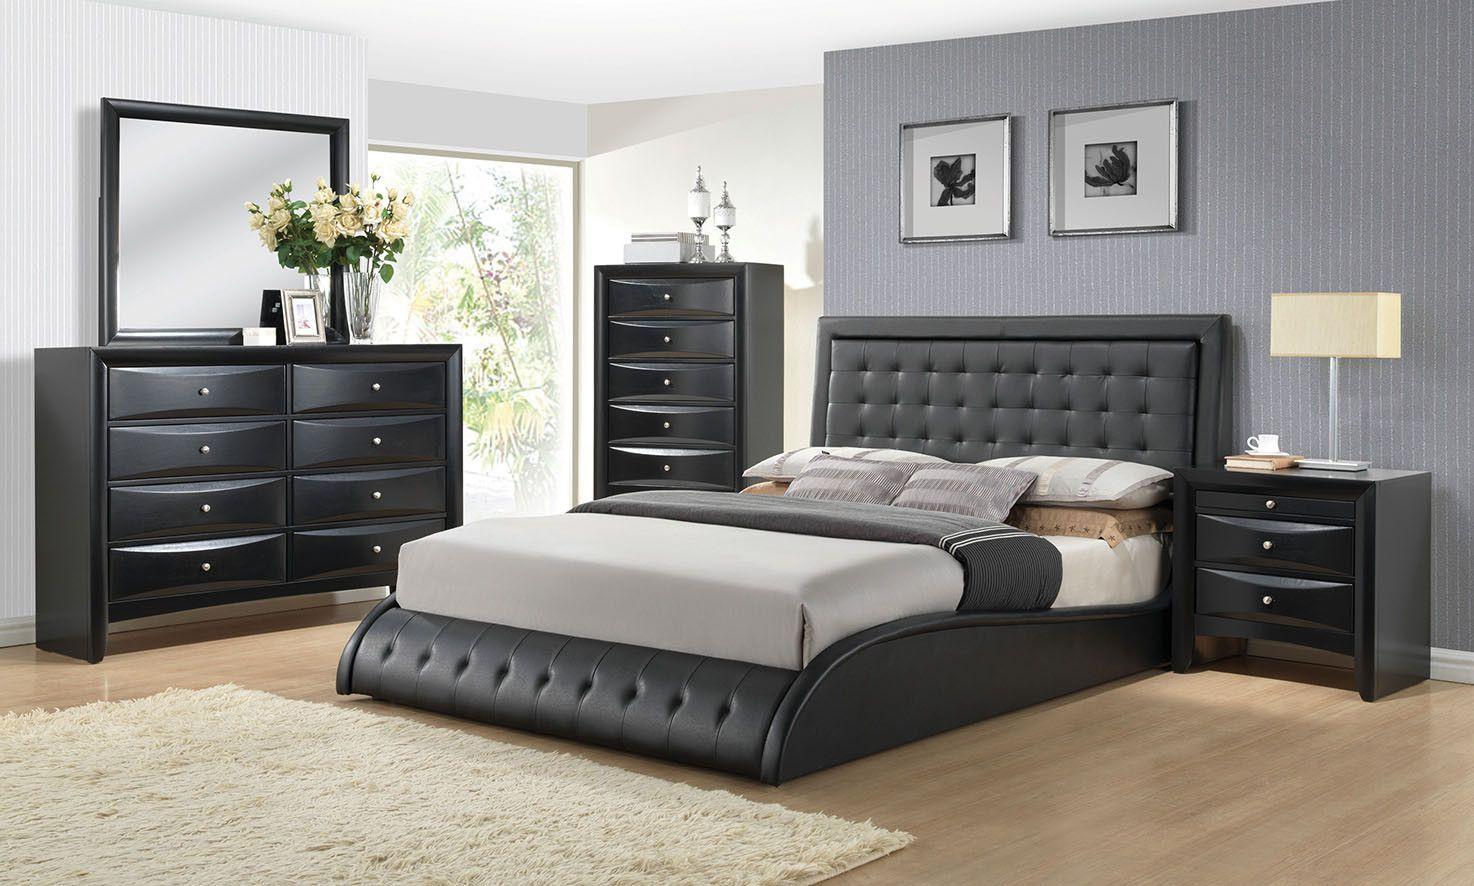 Best Tirrel 4 Pcs Bedroom Sets 1126 Description This 400 x 300